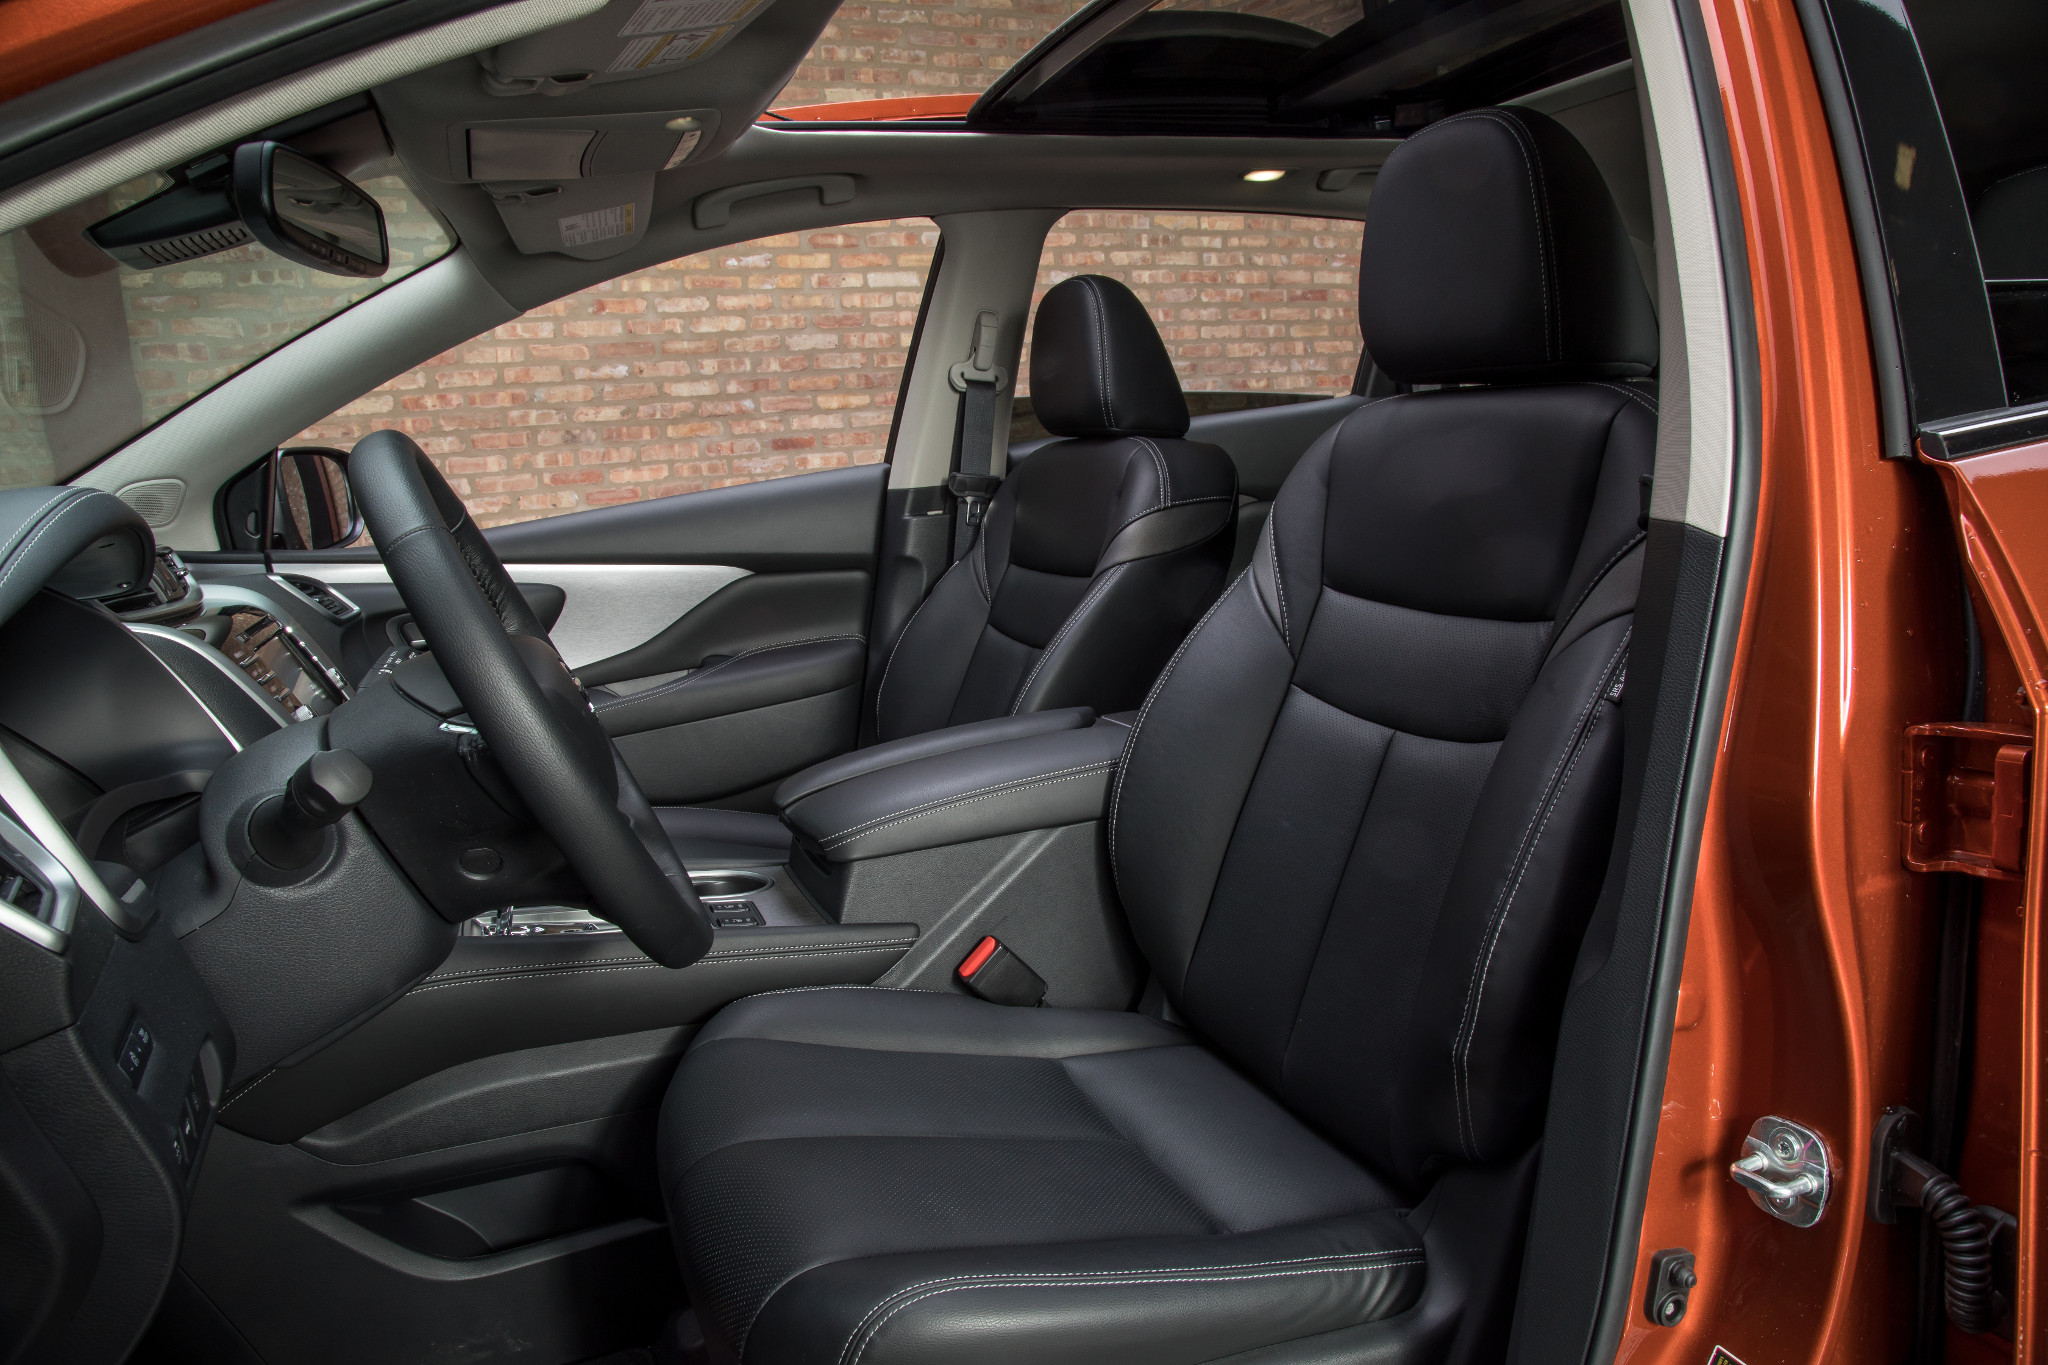 14-nissan-murano-2019-front-row--interior--seat.jpg